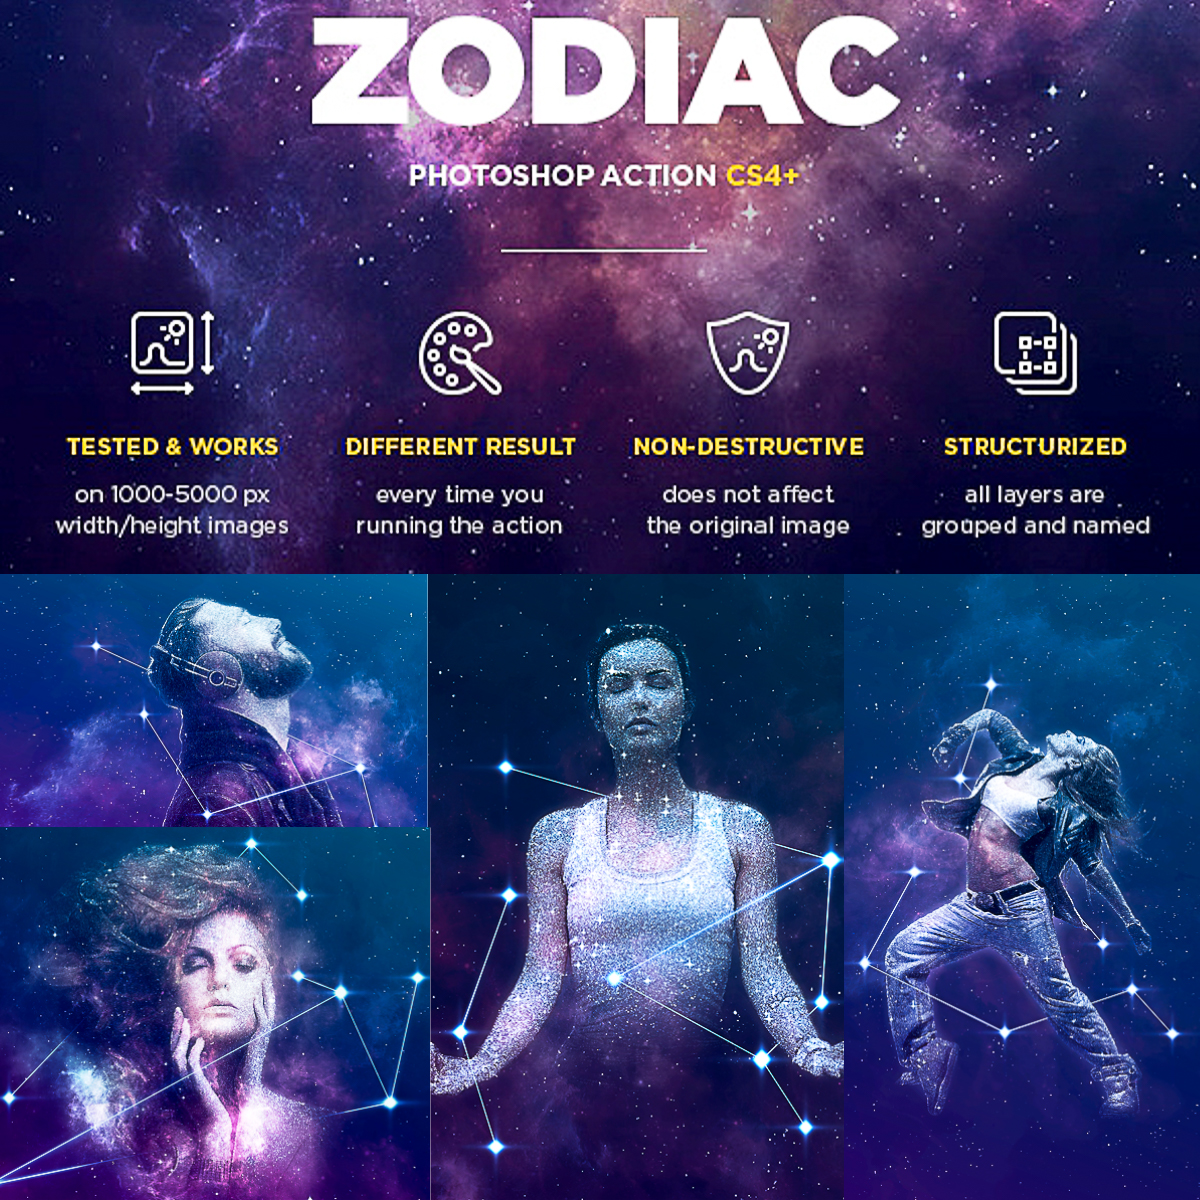 Zodiac Photoshop Action   Free download